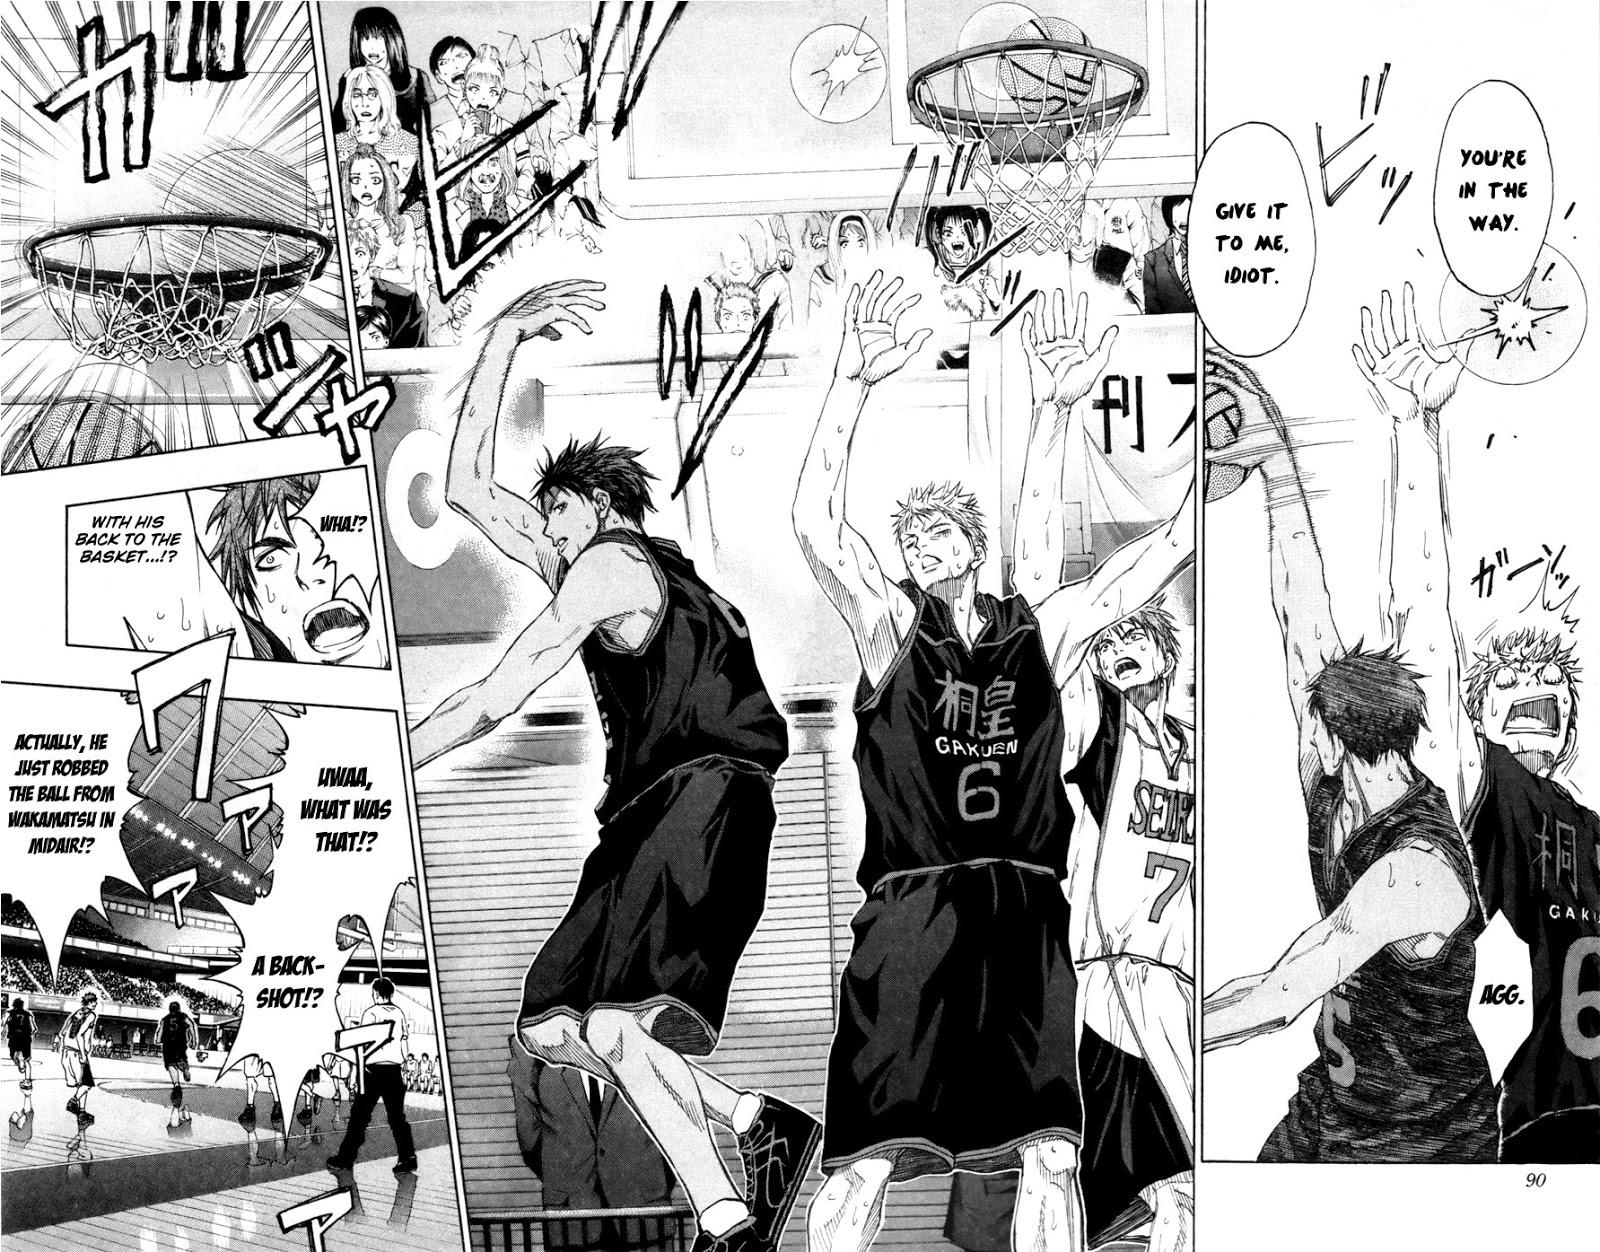 Kuroko no Basket Manga Chapter 122 - Image 05-06